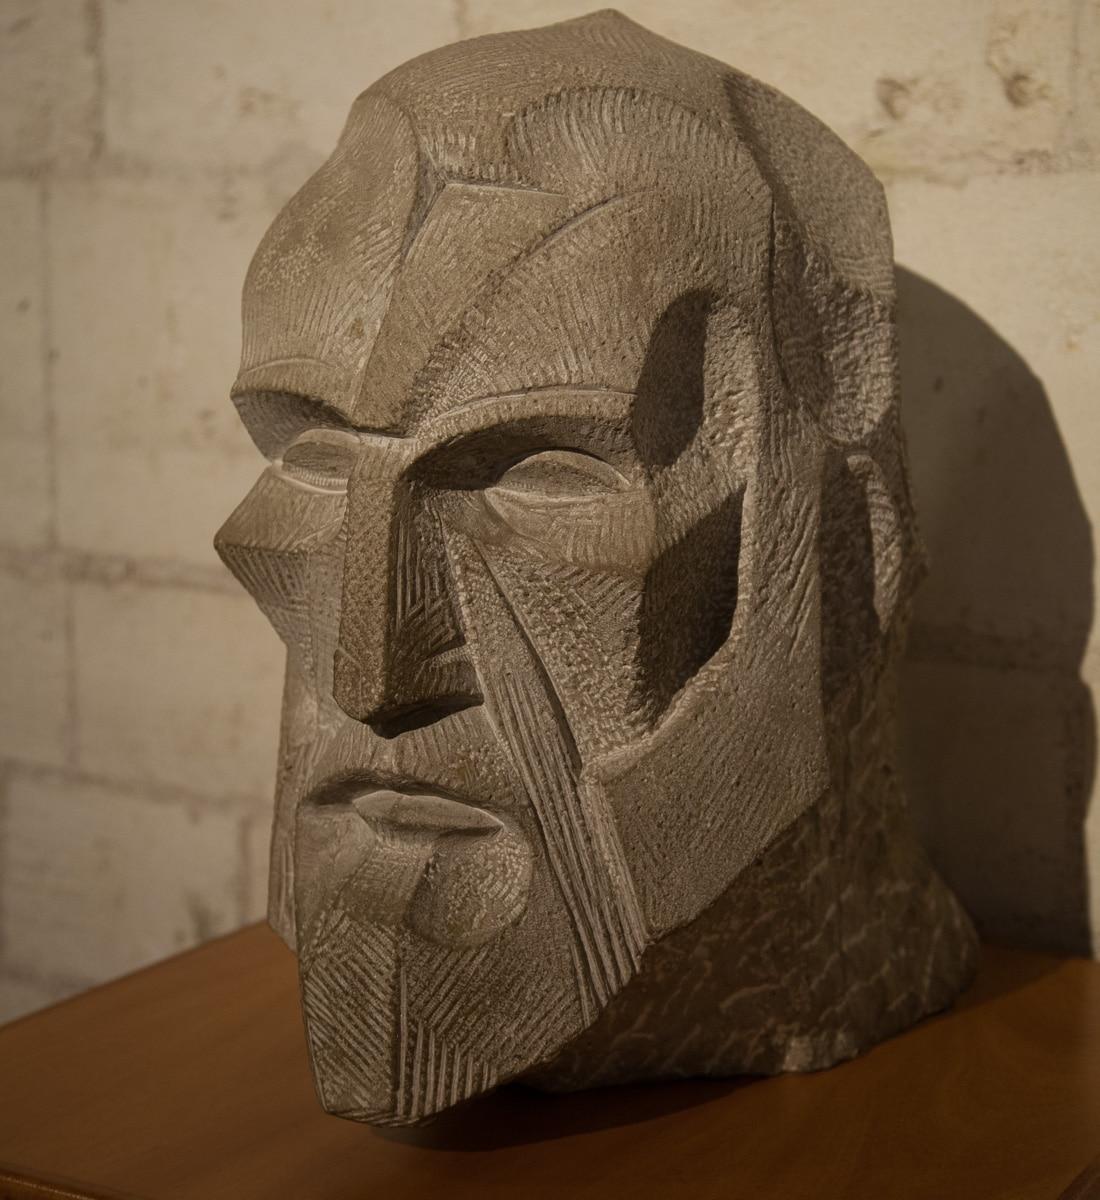 Bust of Antoni Gaudí